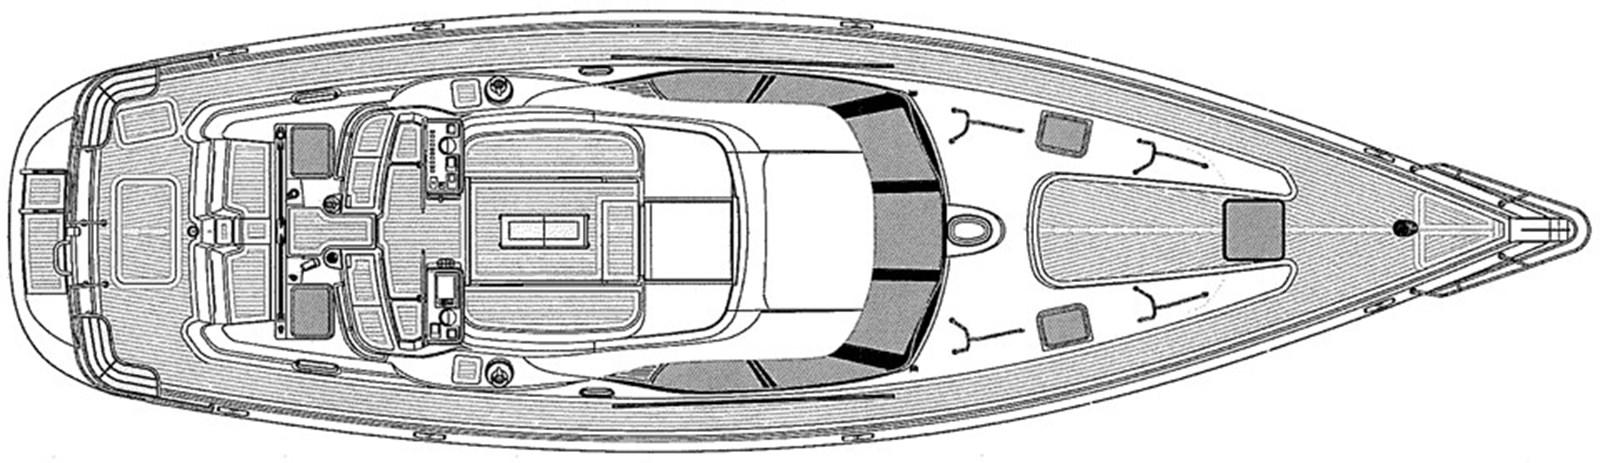 oyster-575-layout-2 2011 OYSTER MARINE LTD Oyster 575 Center Cockpit 2939052